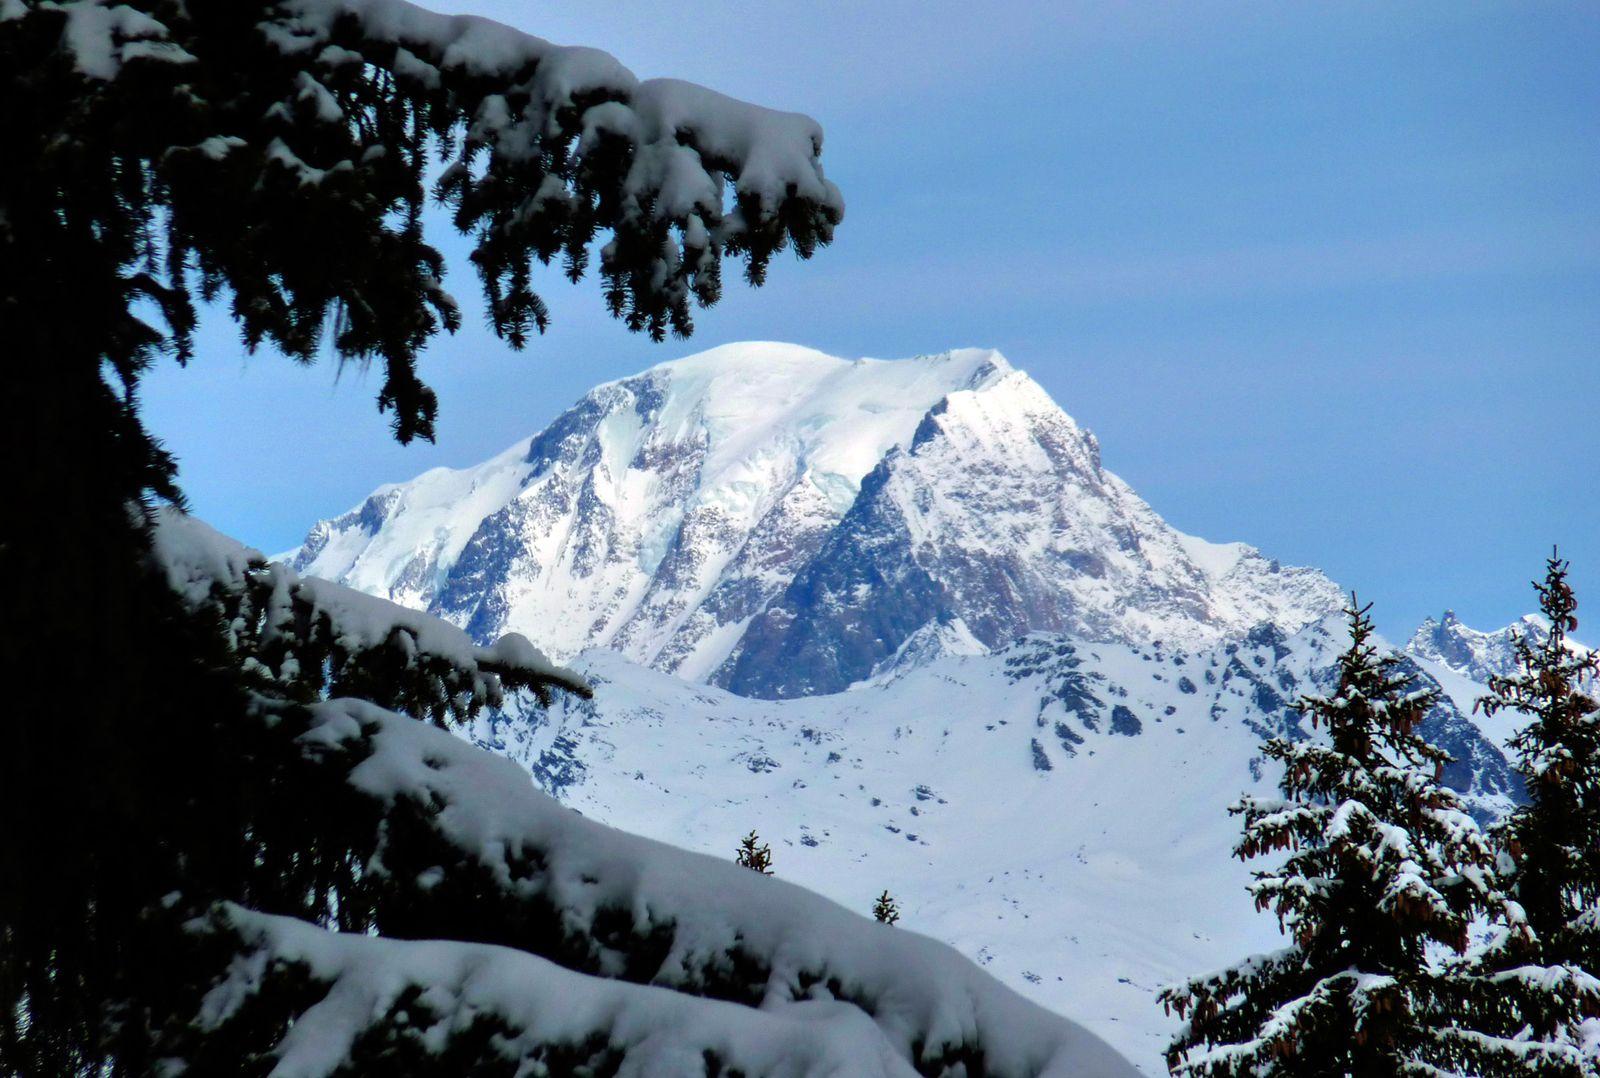 James Bond / Mont-Blanc